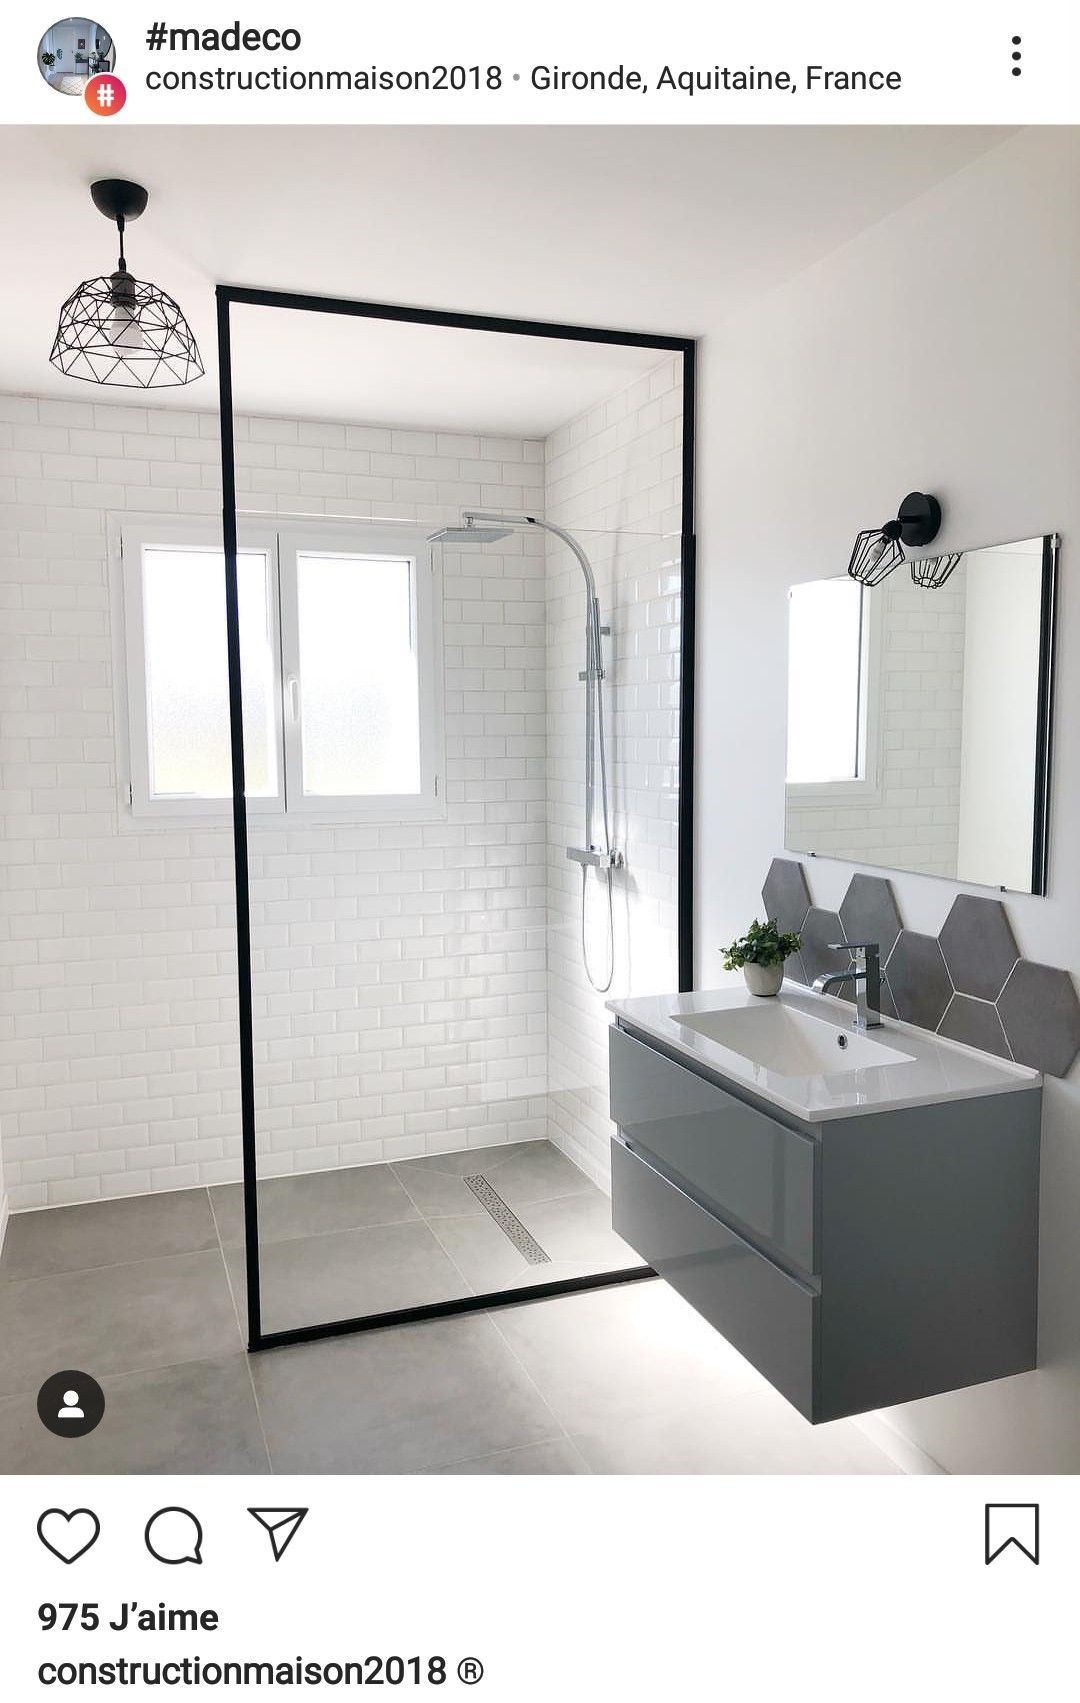 49+ Cadre deco salle de bain ideas in 2021